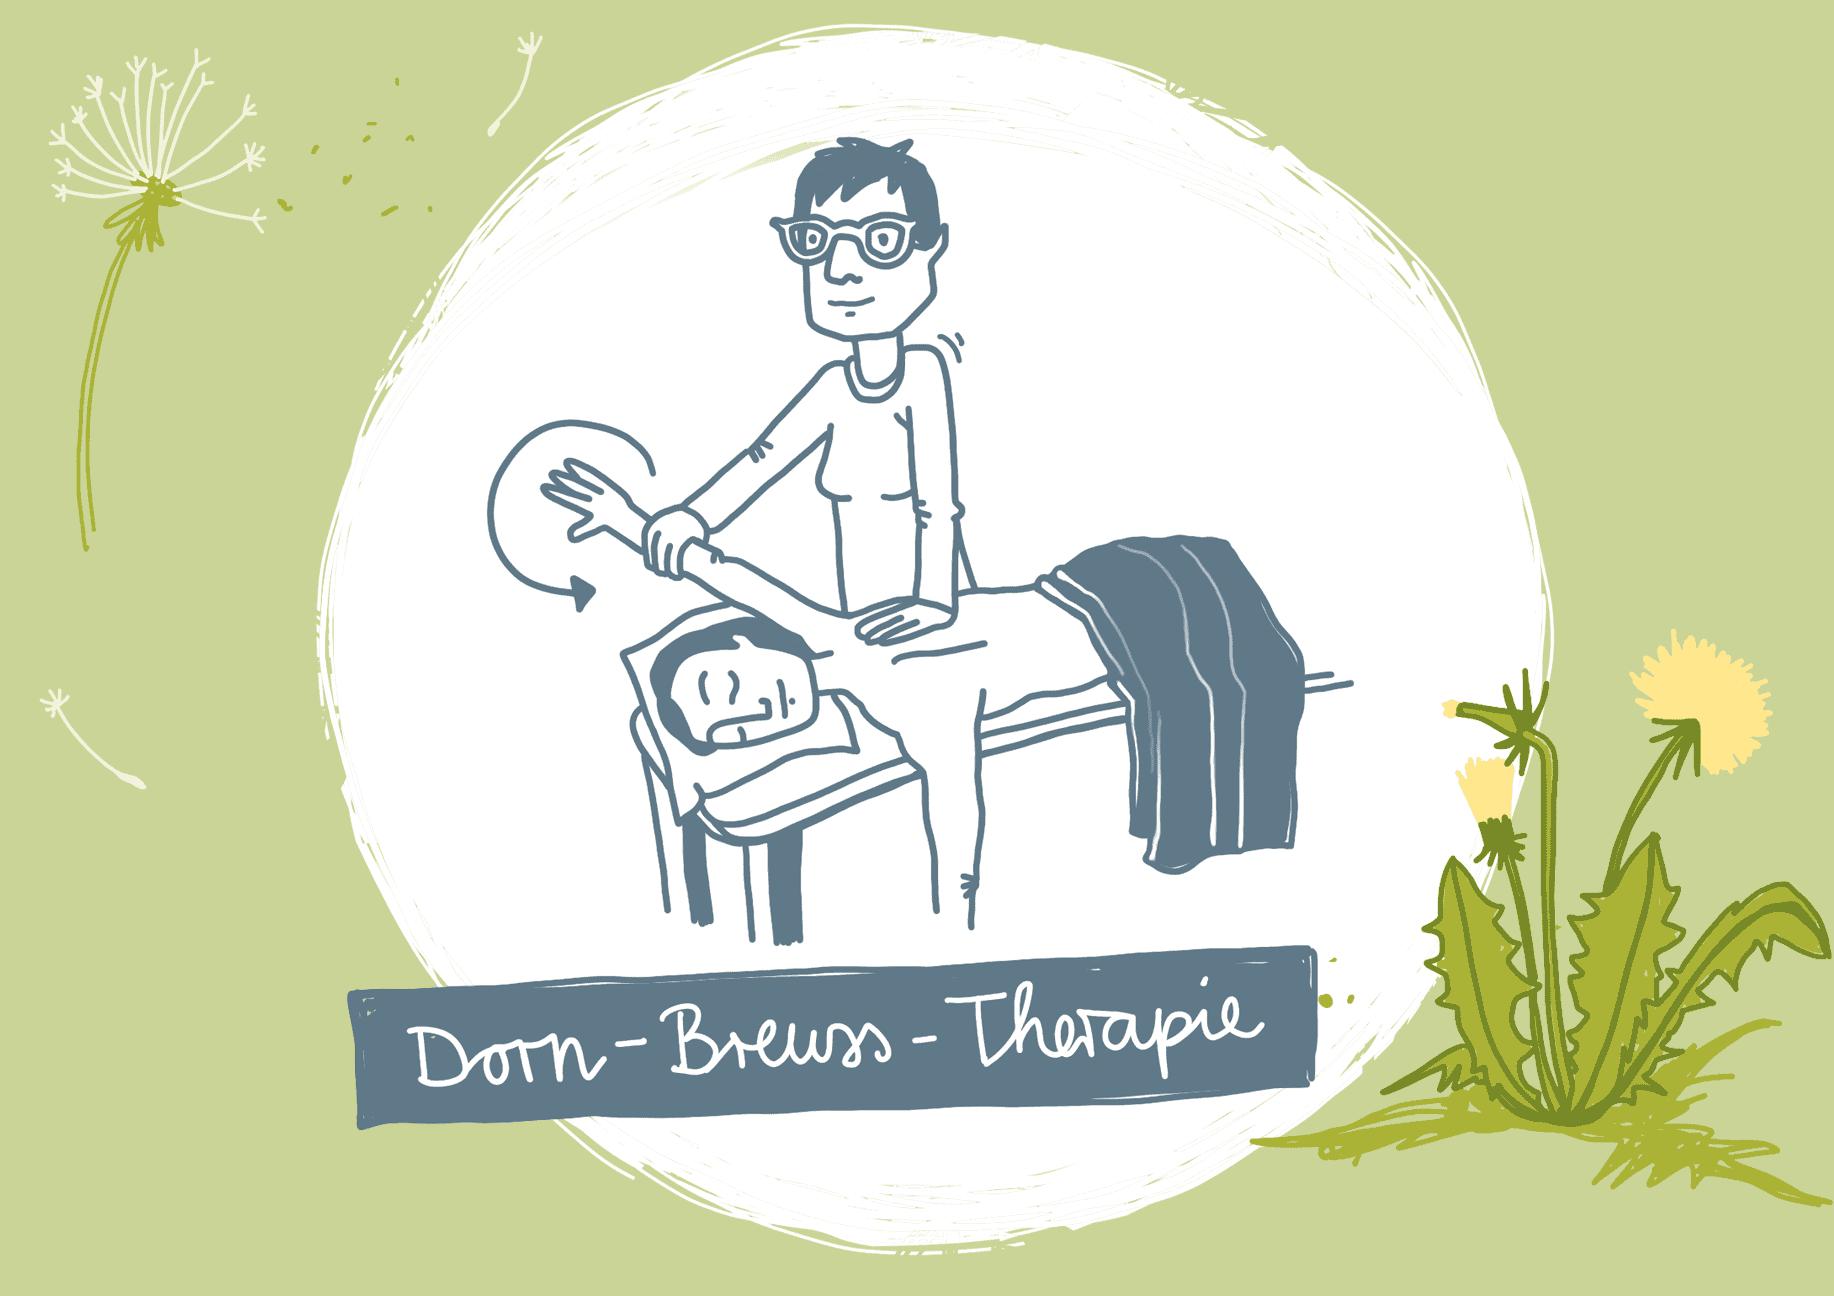 Dorn-Breuss-Therapie